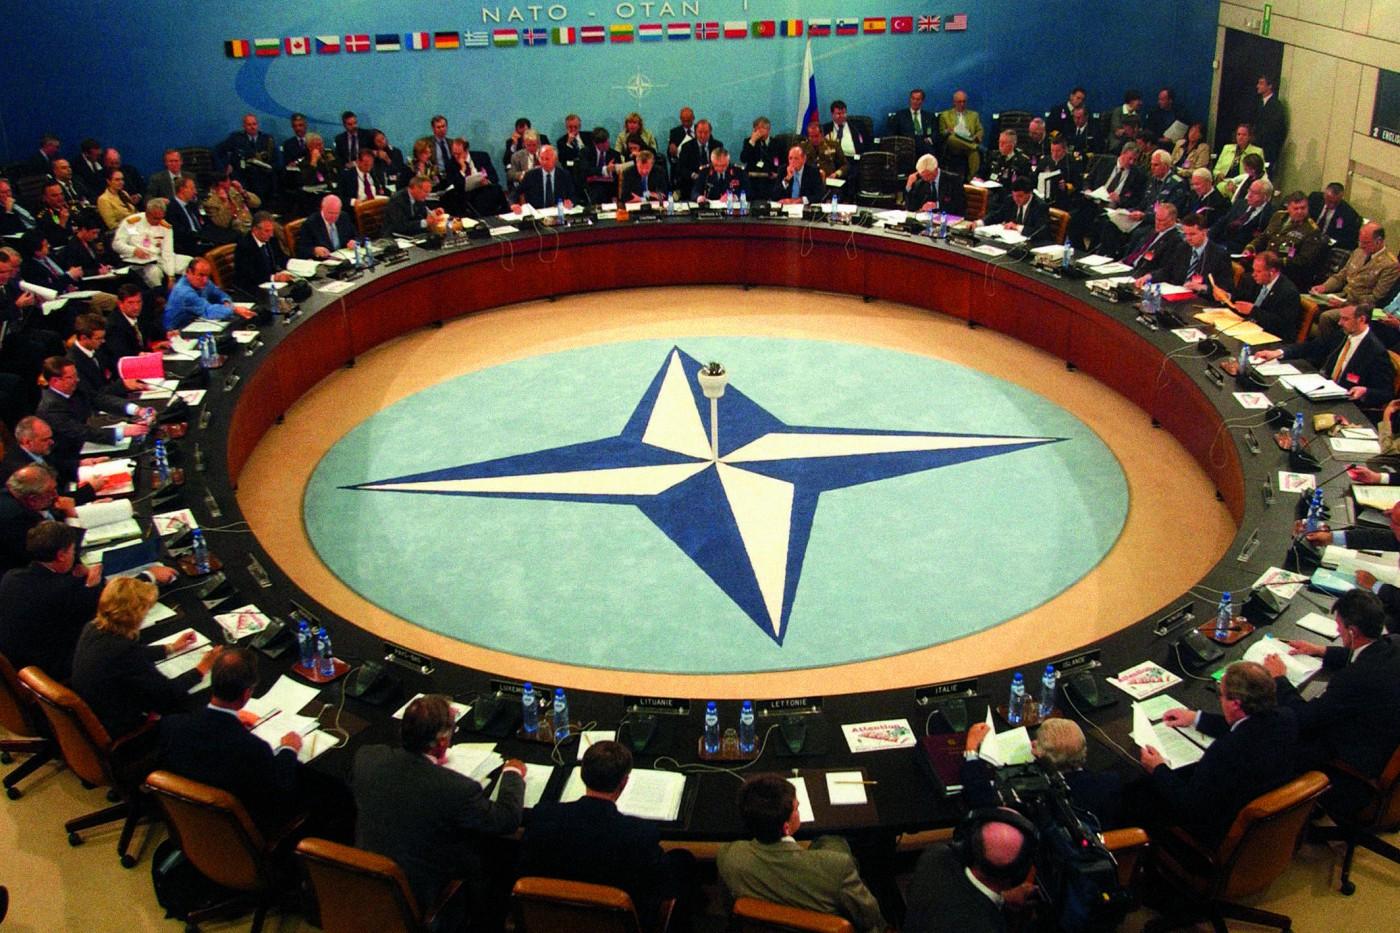 REUNION OTAN